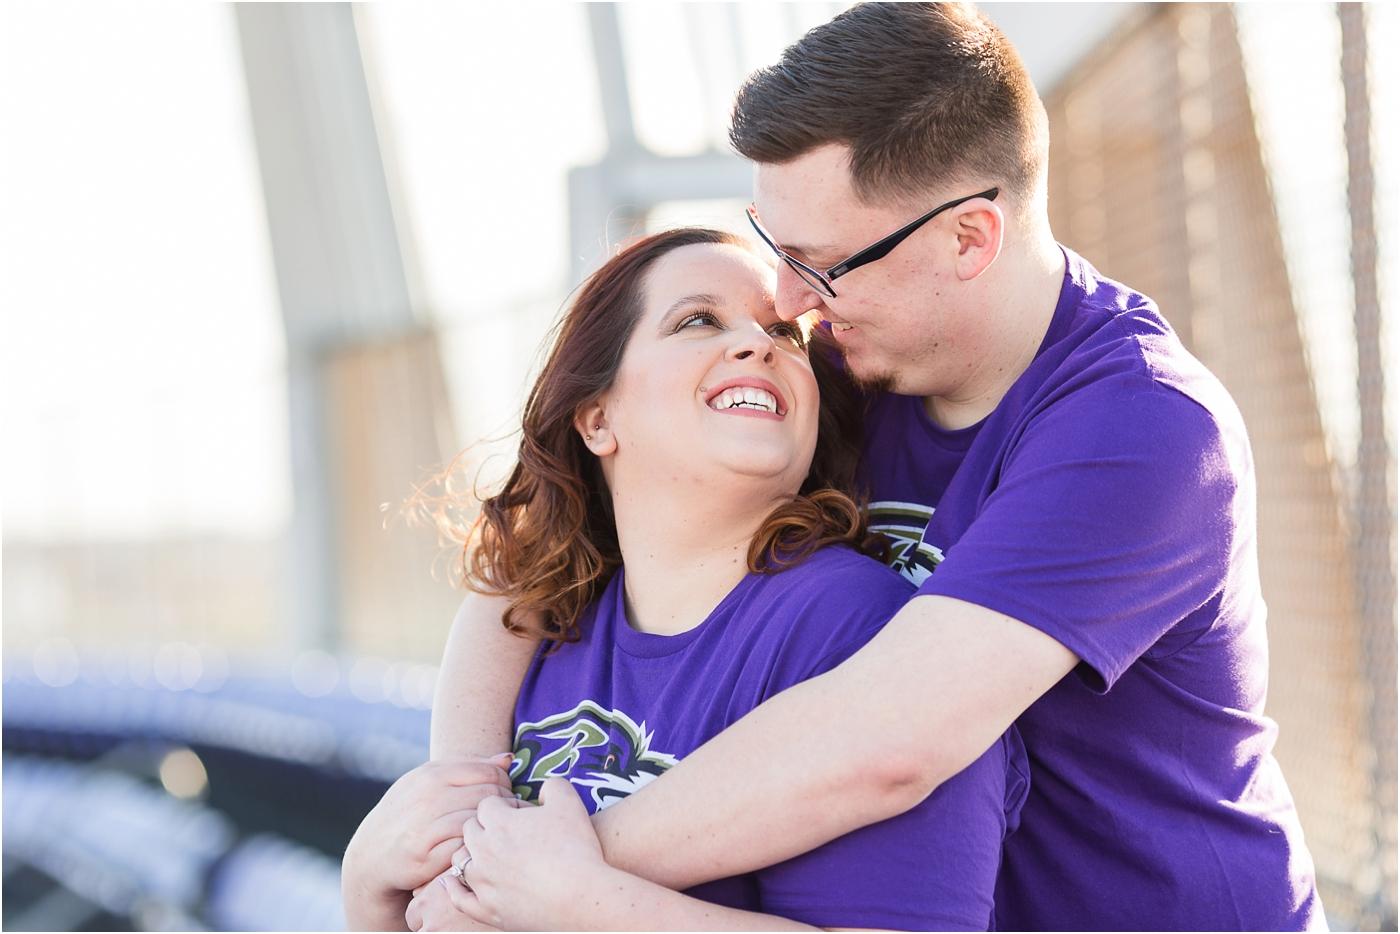 Ravens-Stadium-Engagement-Photos-20.jpg